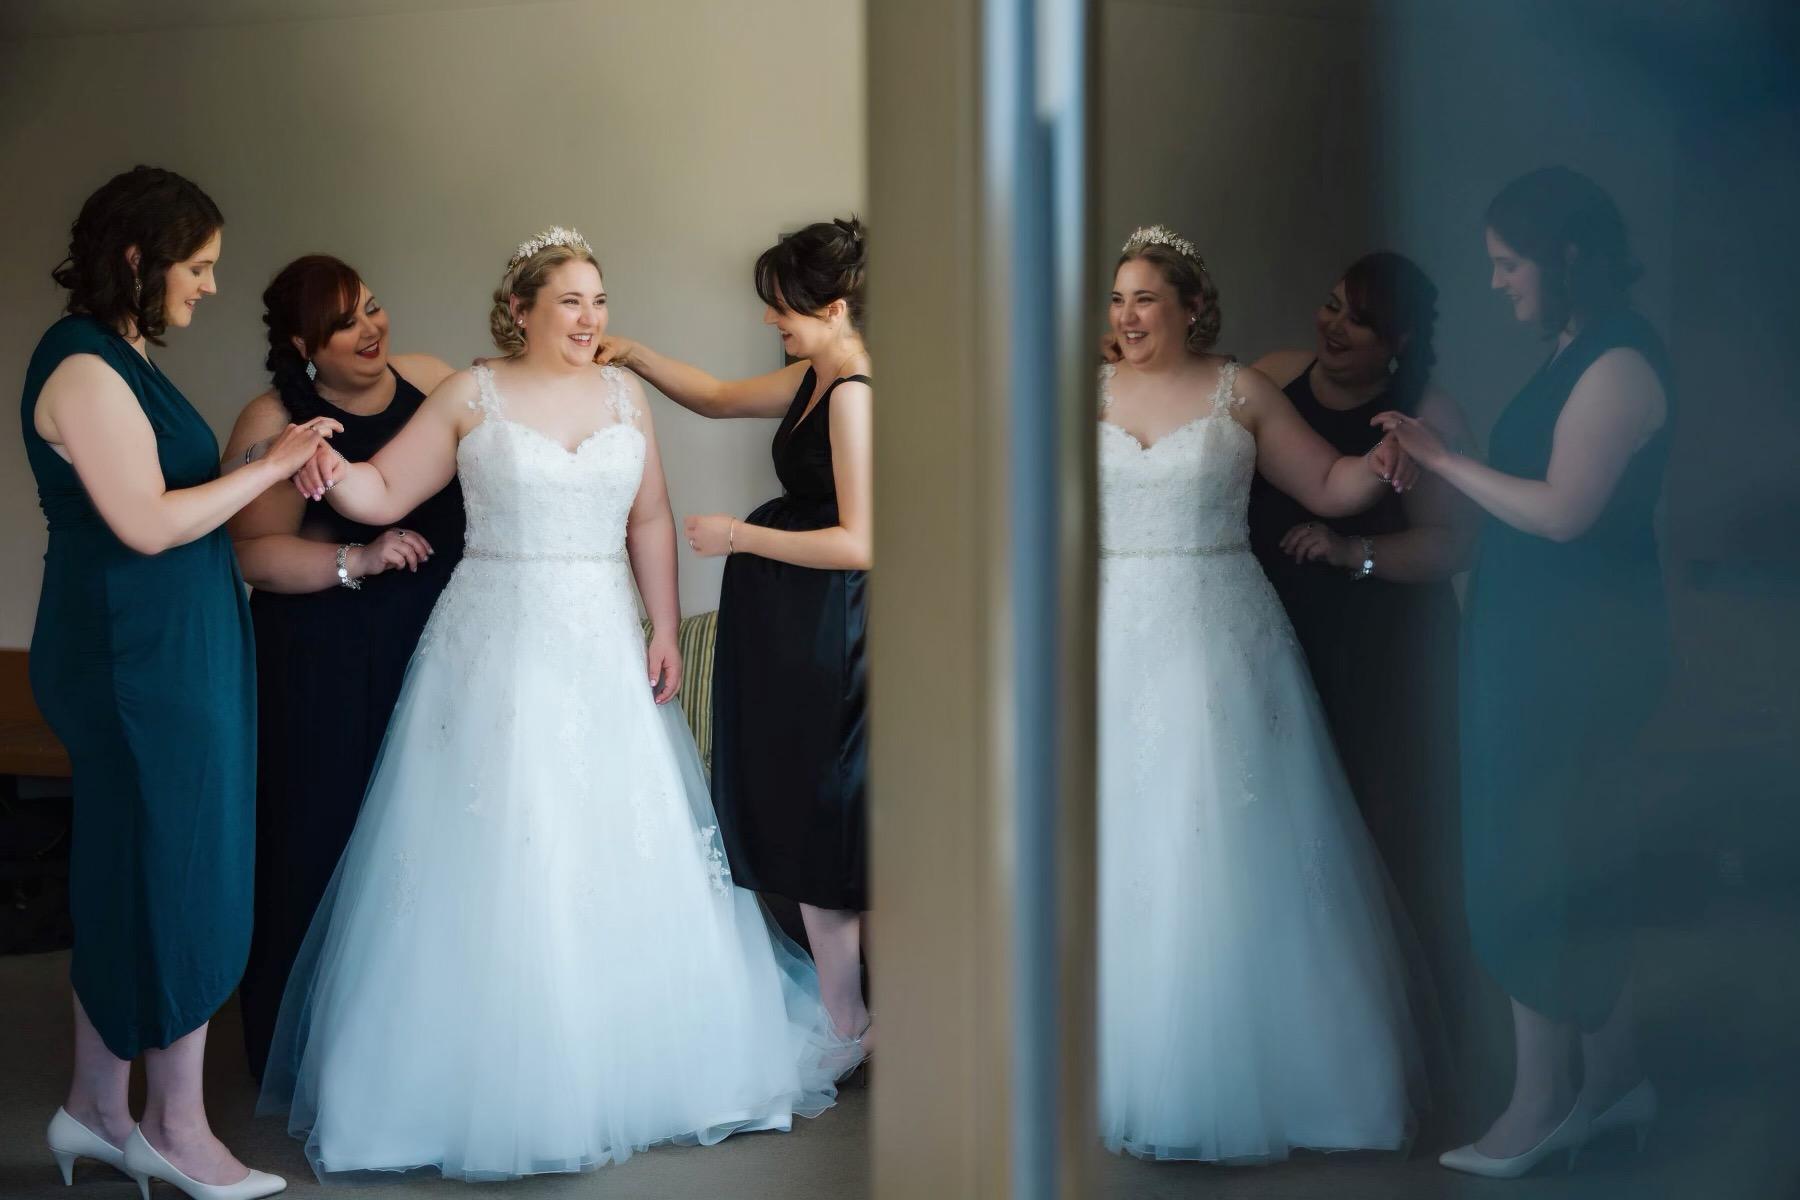 Melbourne bride makeup artist